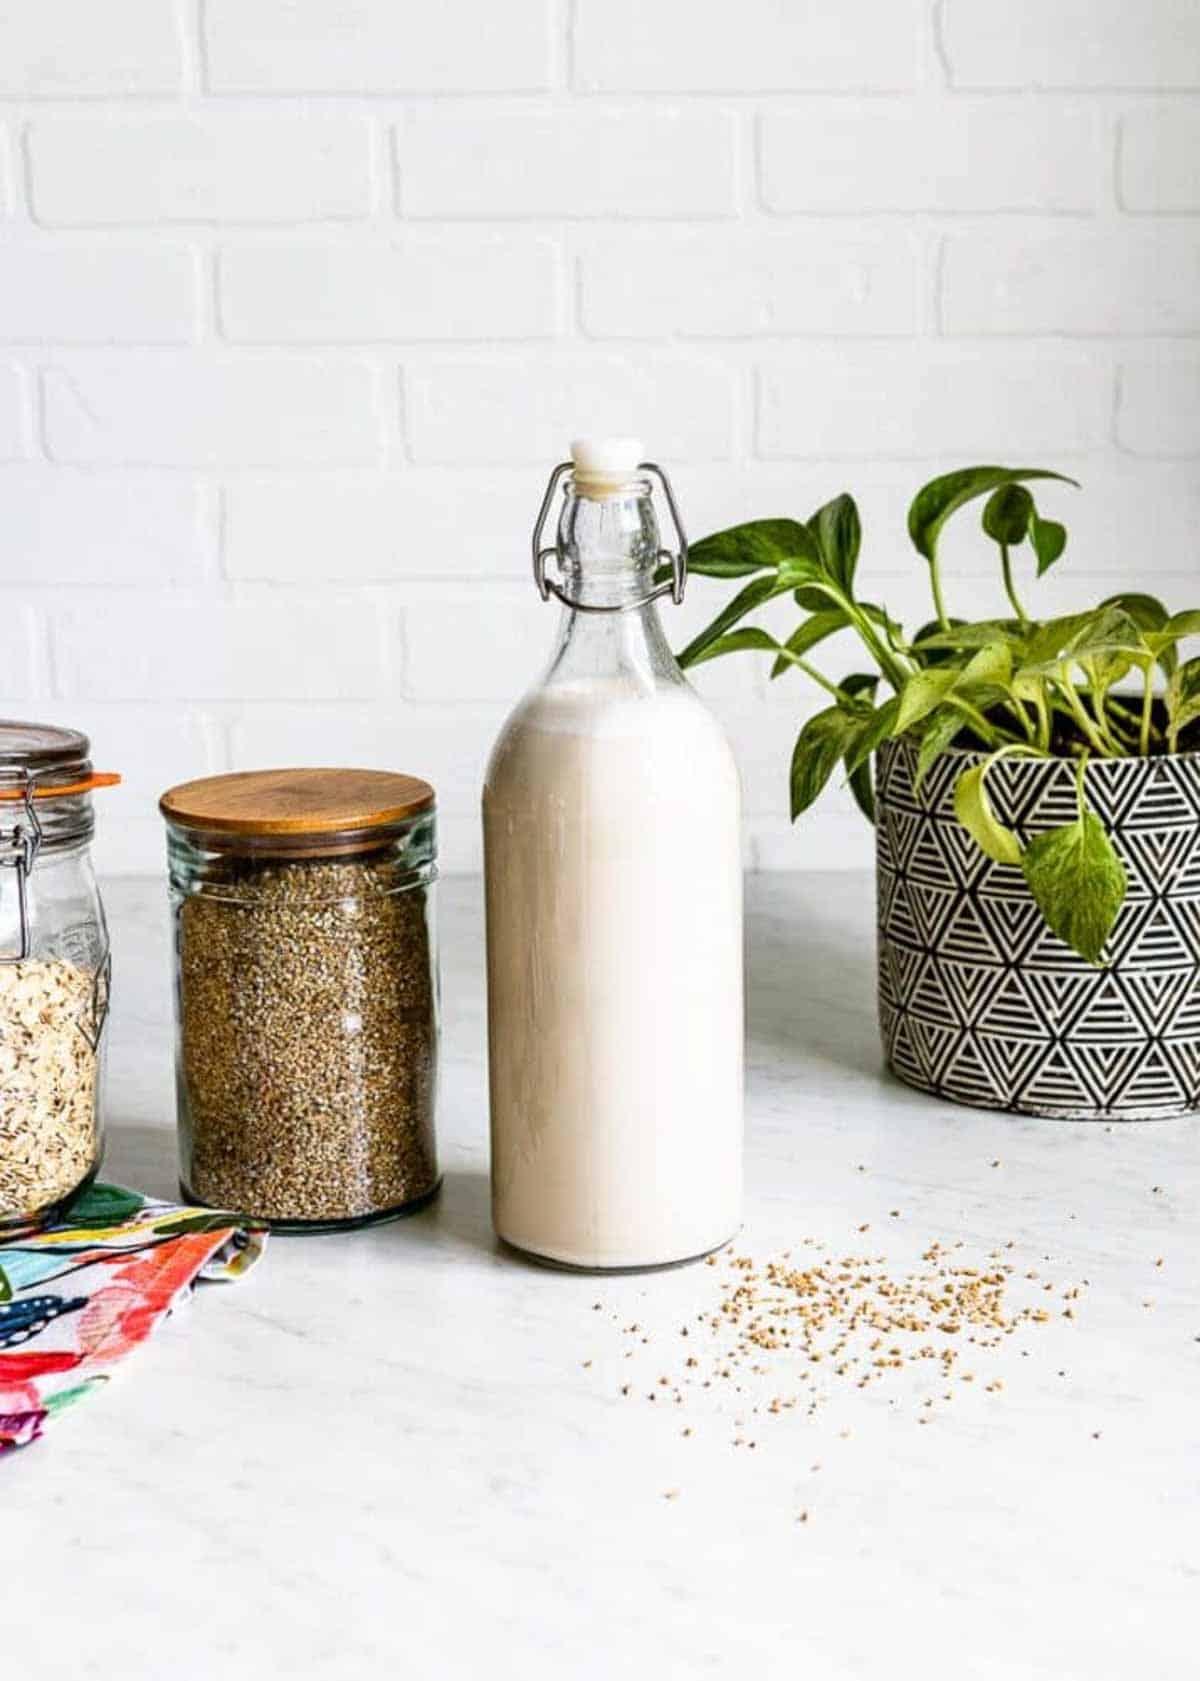 homemade plant milk